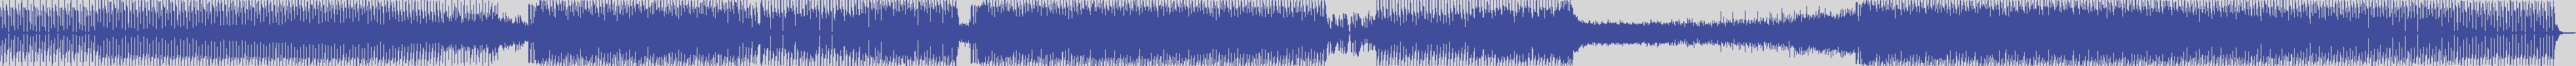 worldwide_music_records [WMR002] Dezuna - Mob Thing [Original Mix] audio wave form